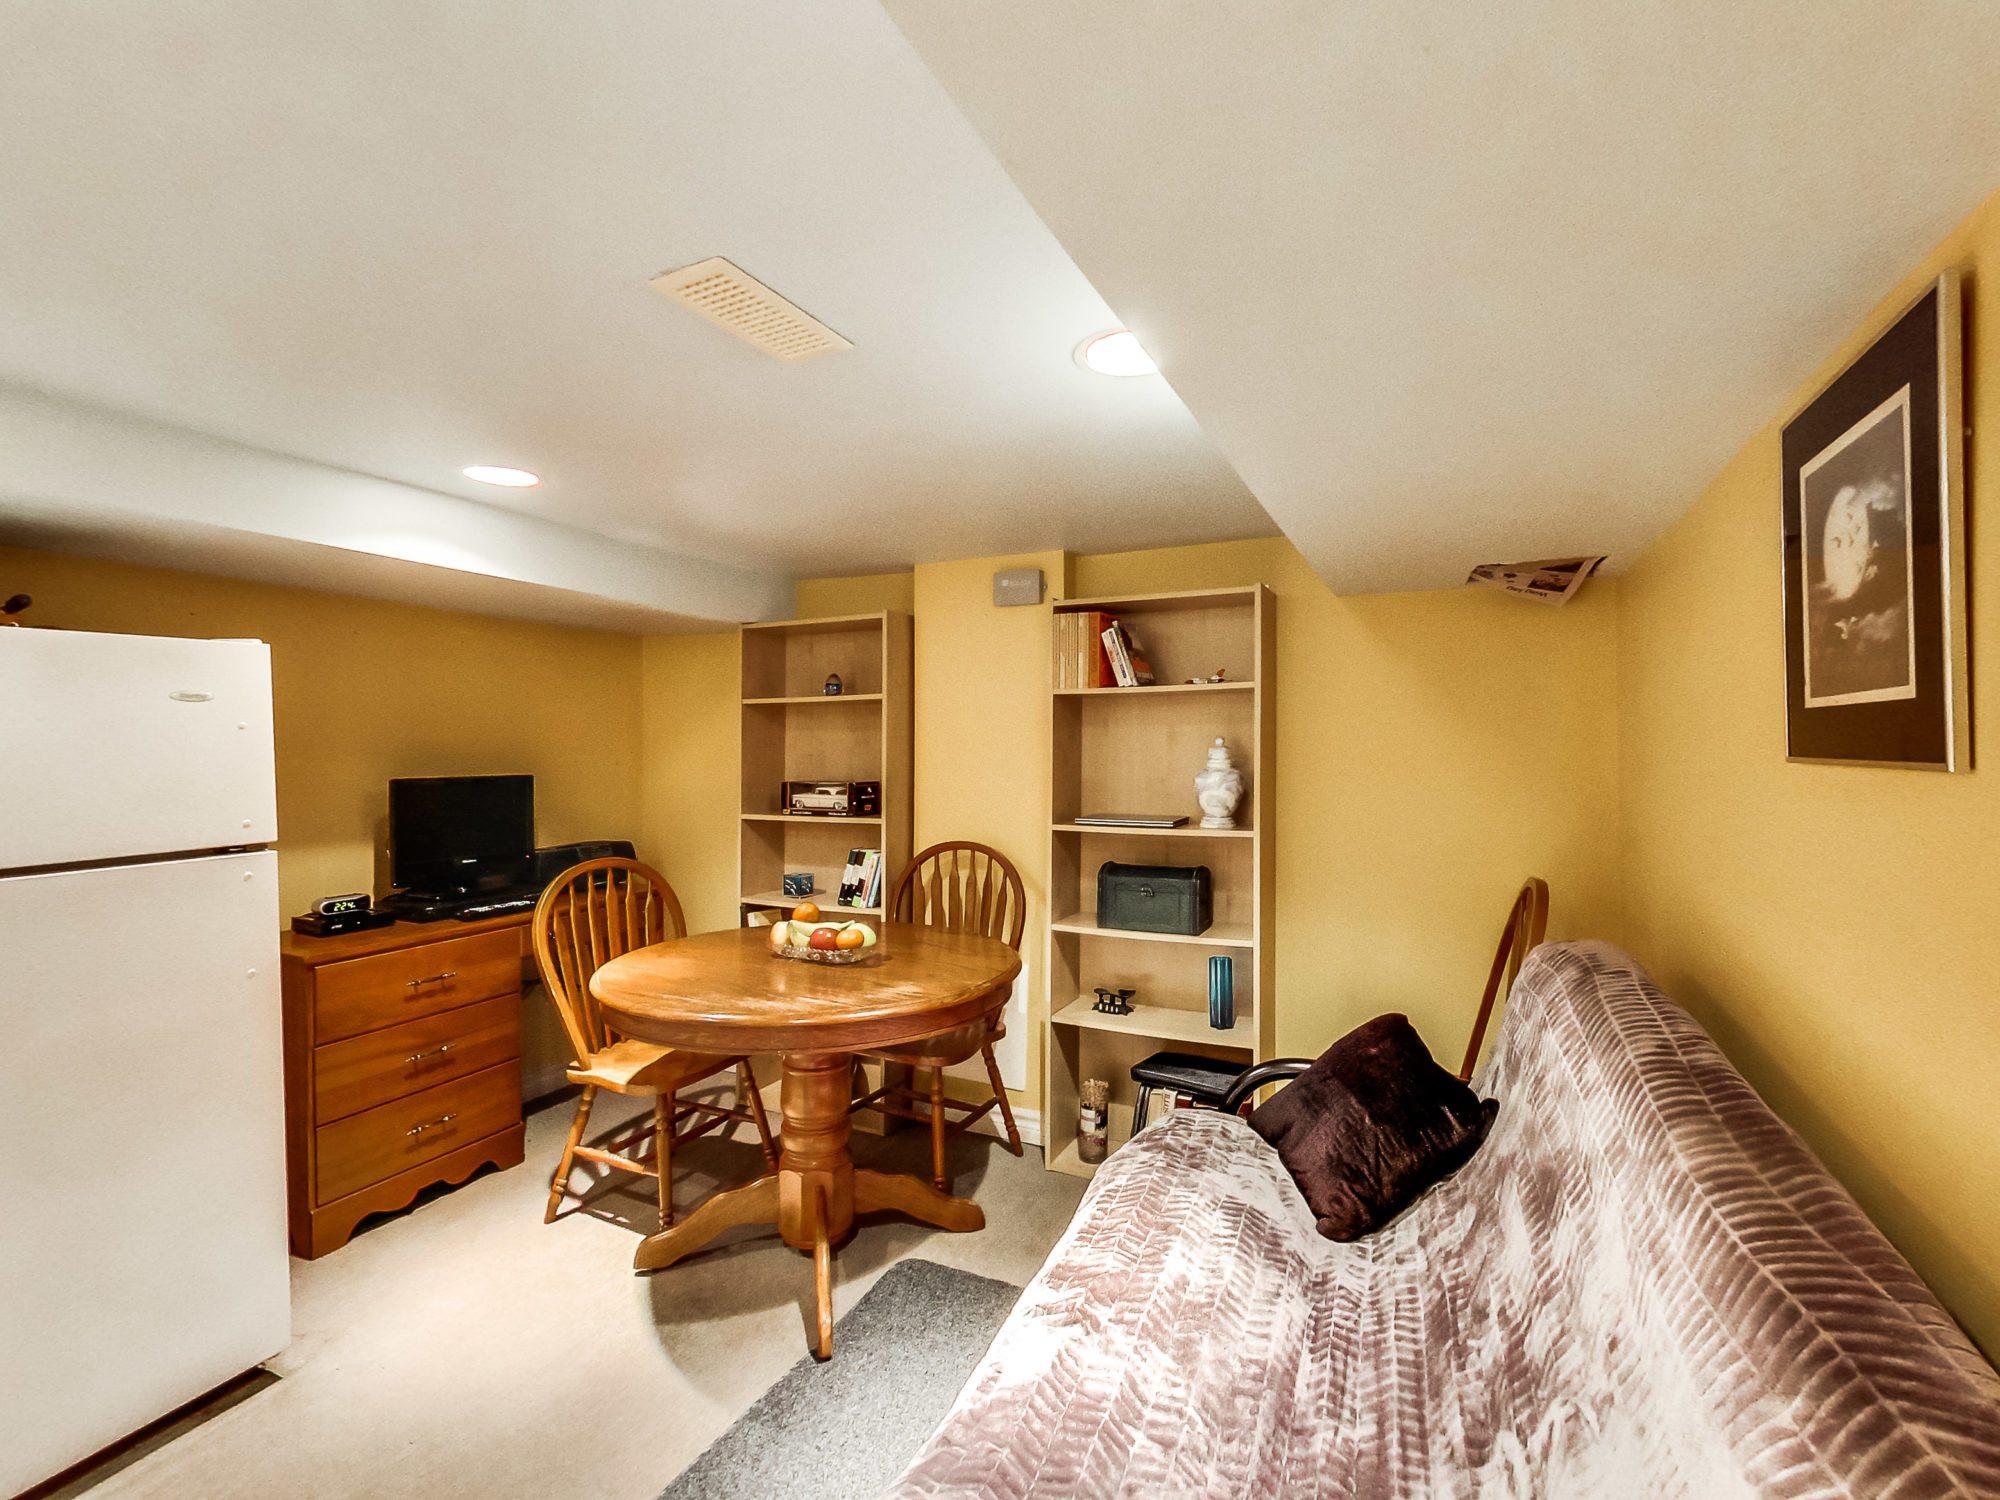 toronto-house-sold-71-hertle-avenue-12